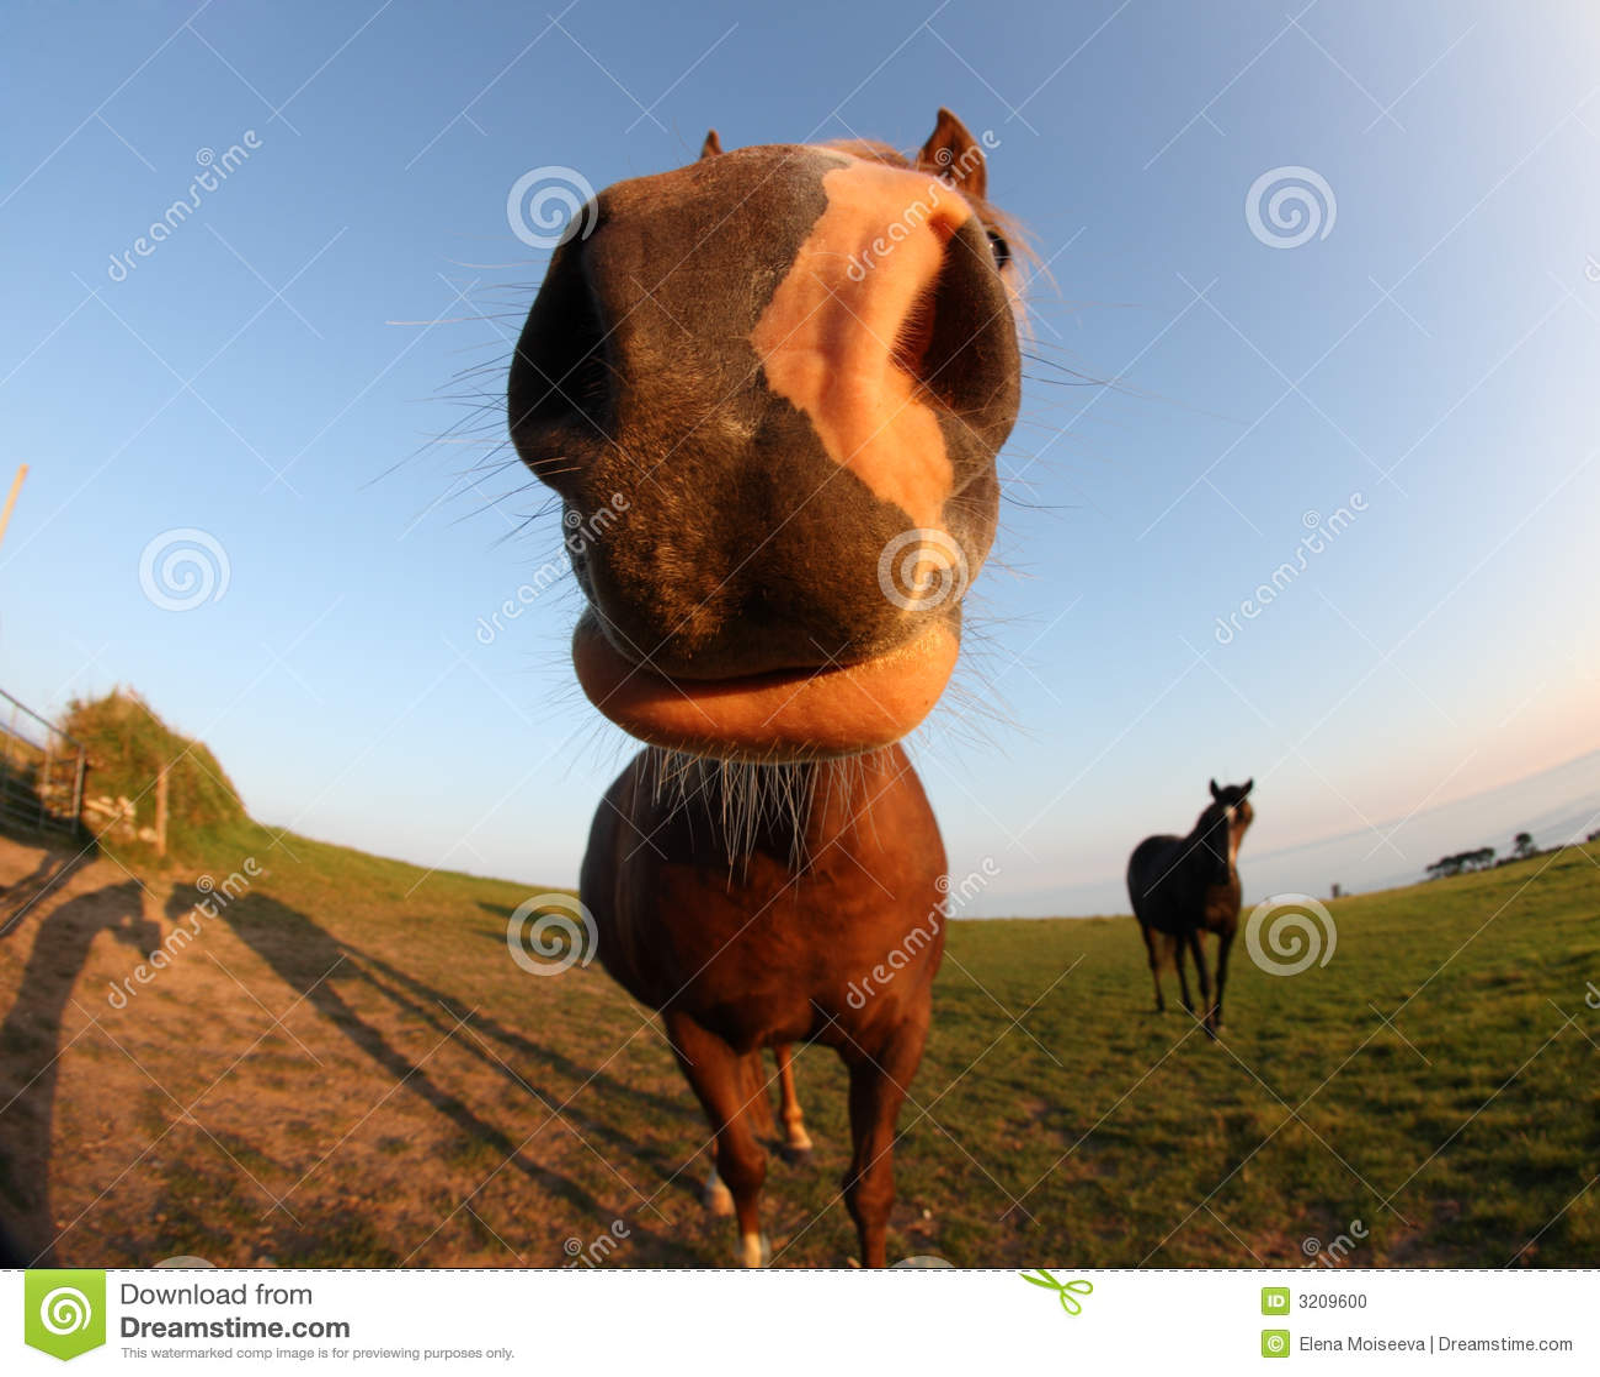 Animal Farm Wallpaper Fisheye Lens Funny Horse Stock Photo Image Of Horse